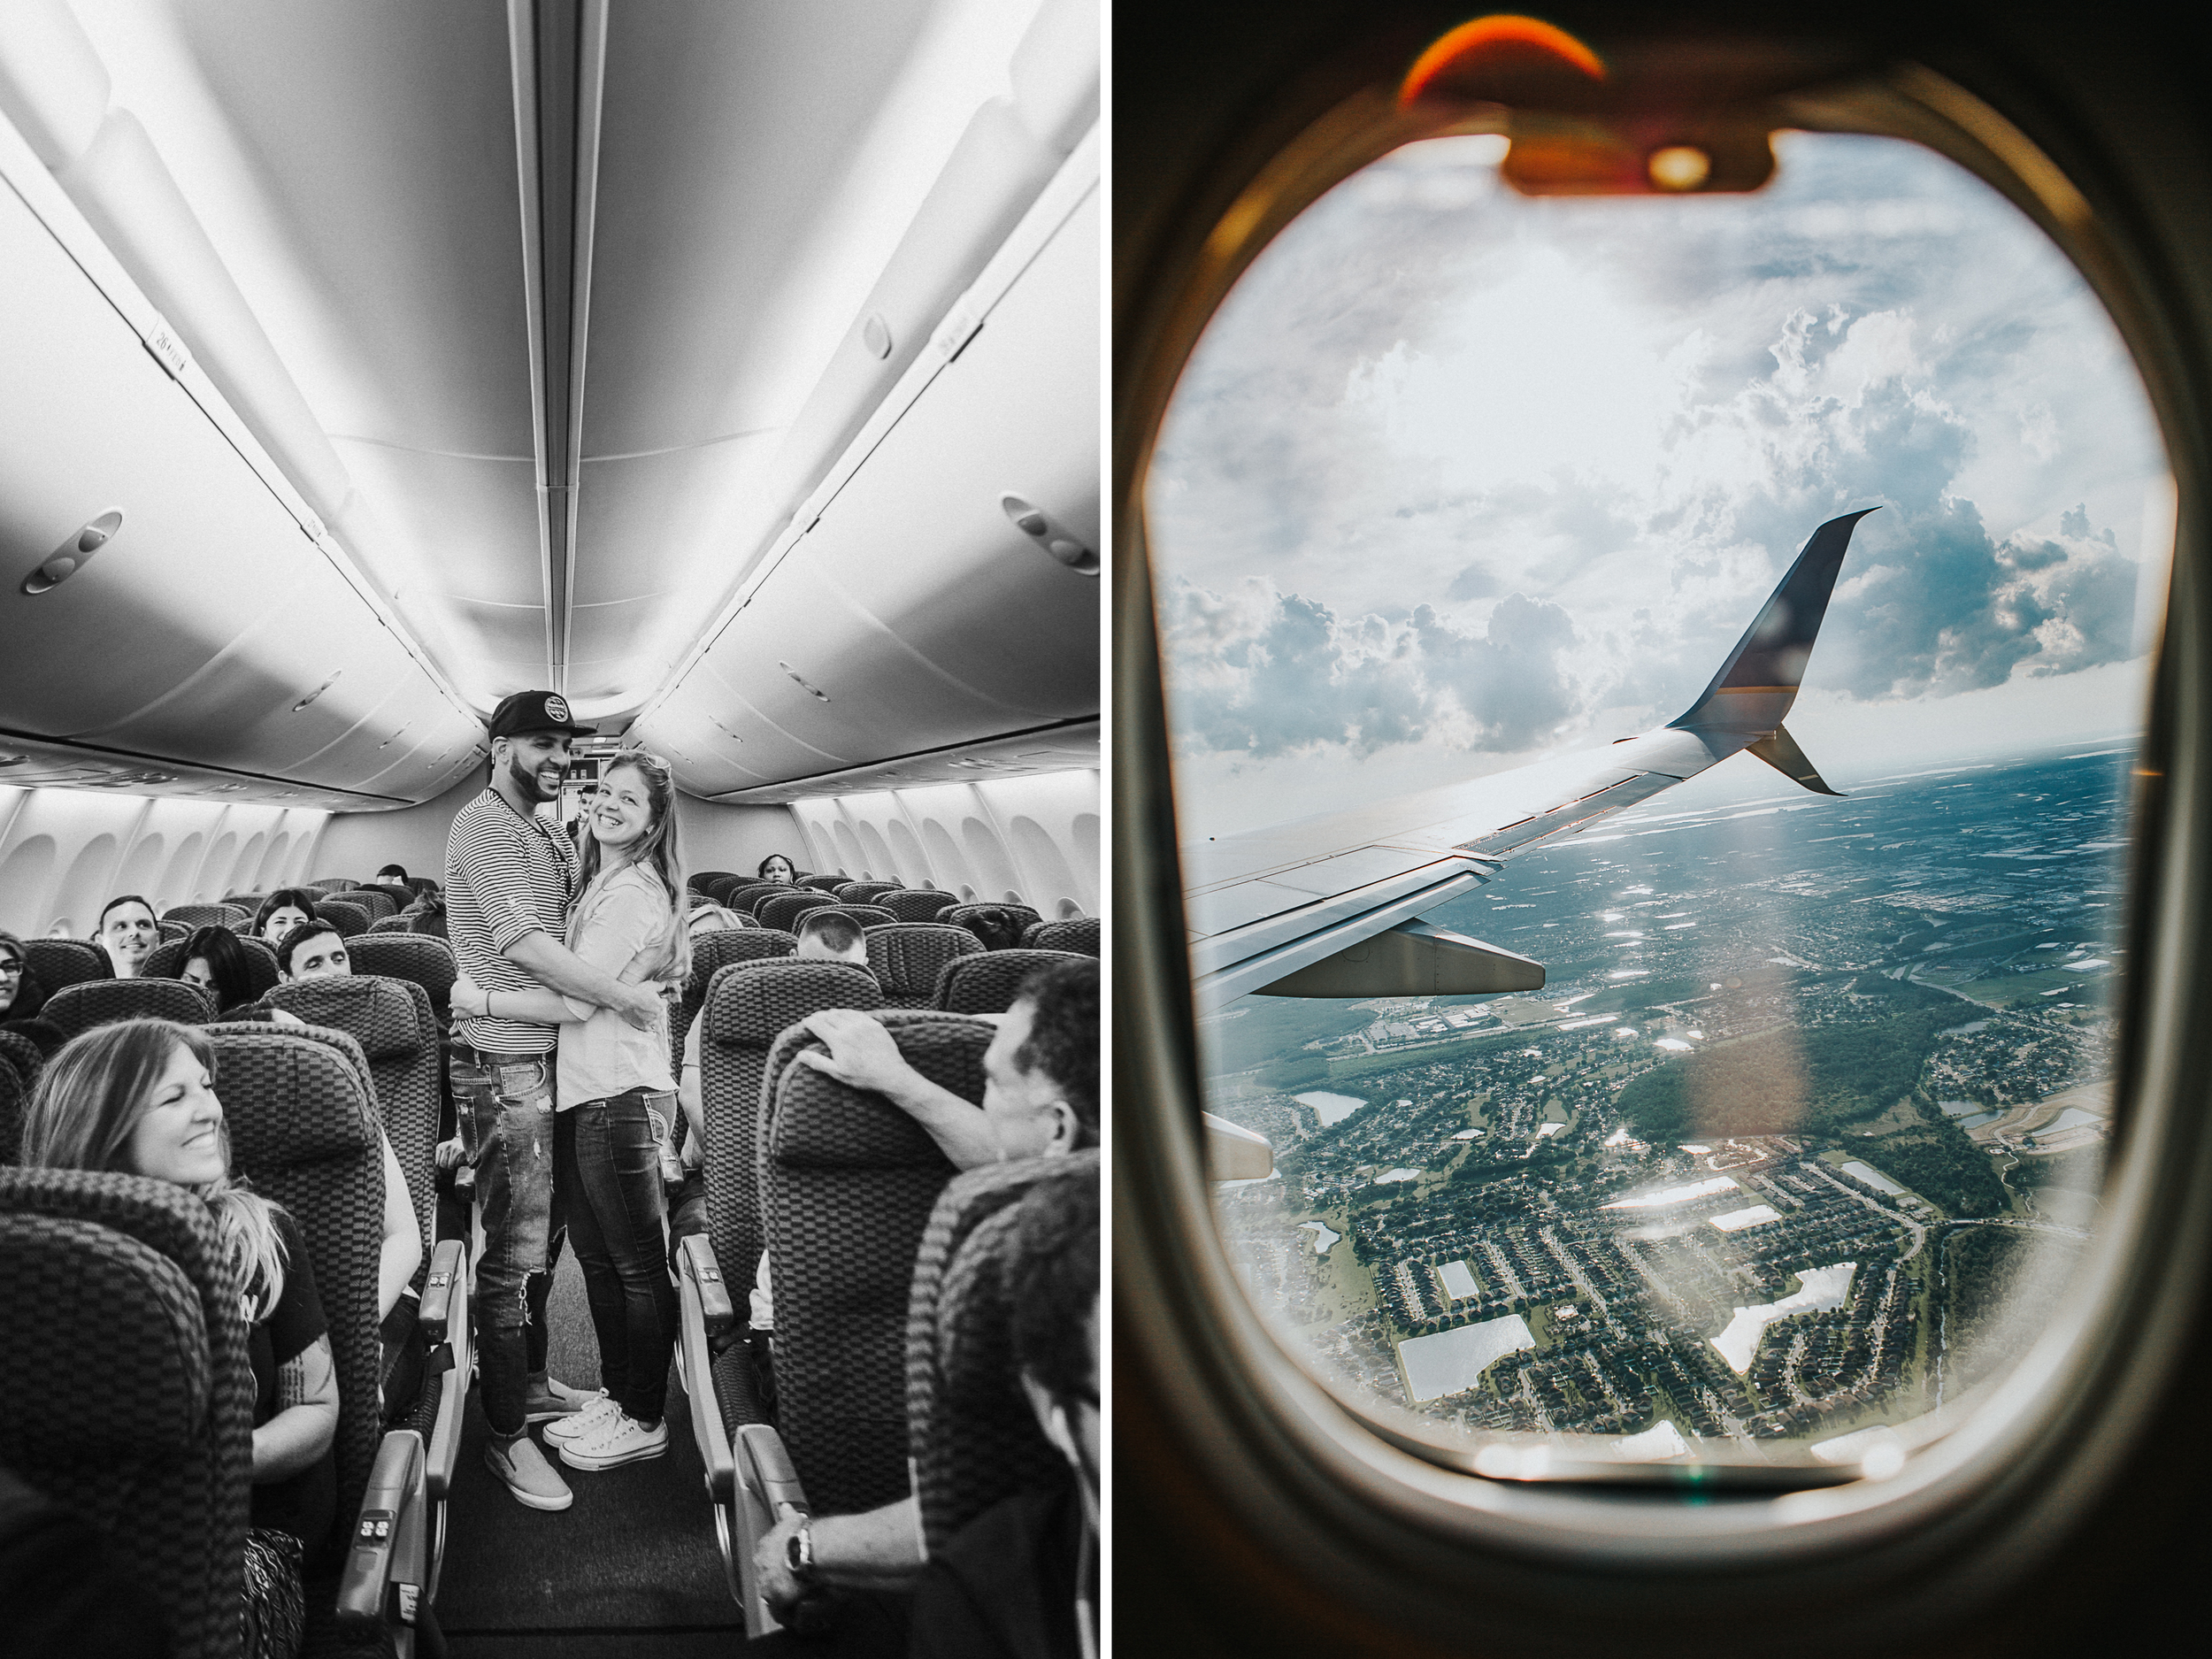 orlando-Destination-wedding-photographer-bride-groom-travel-airplane-couple.jpg